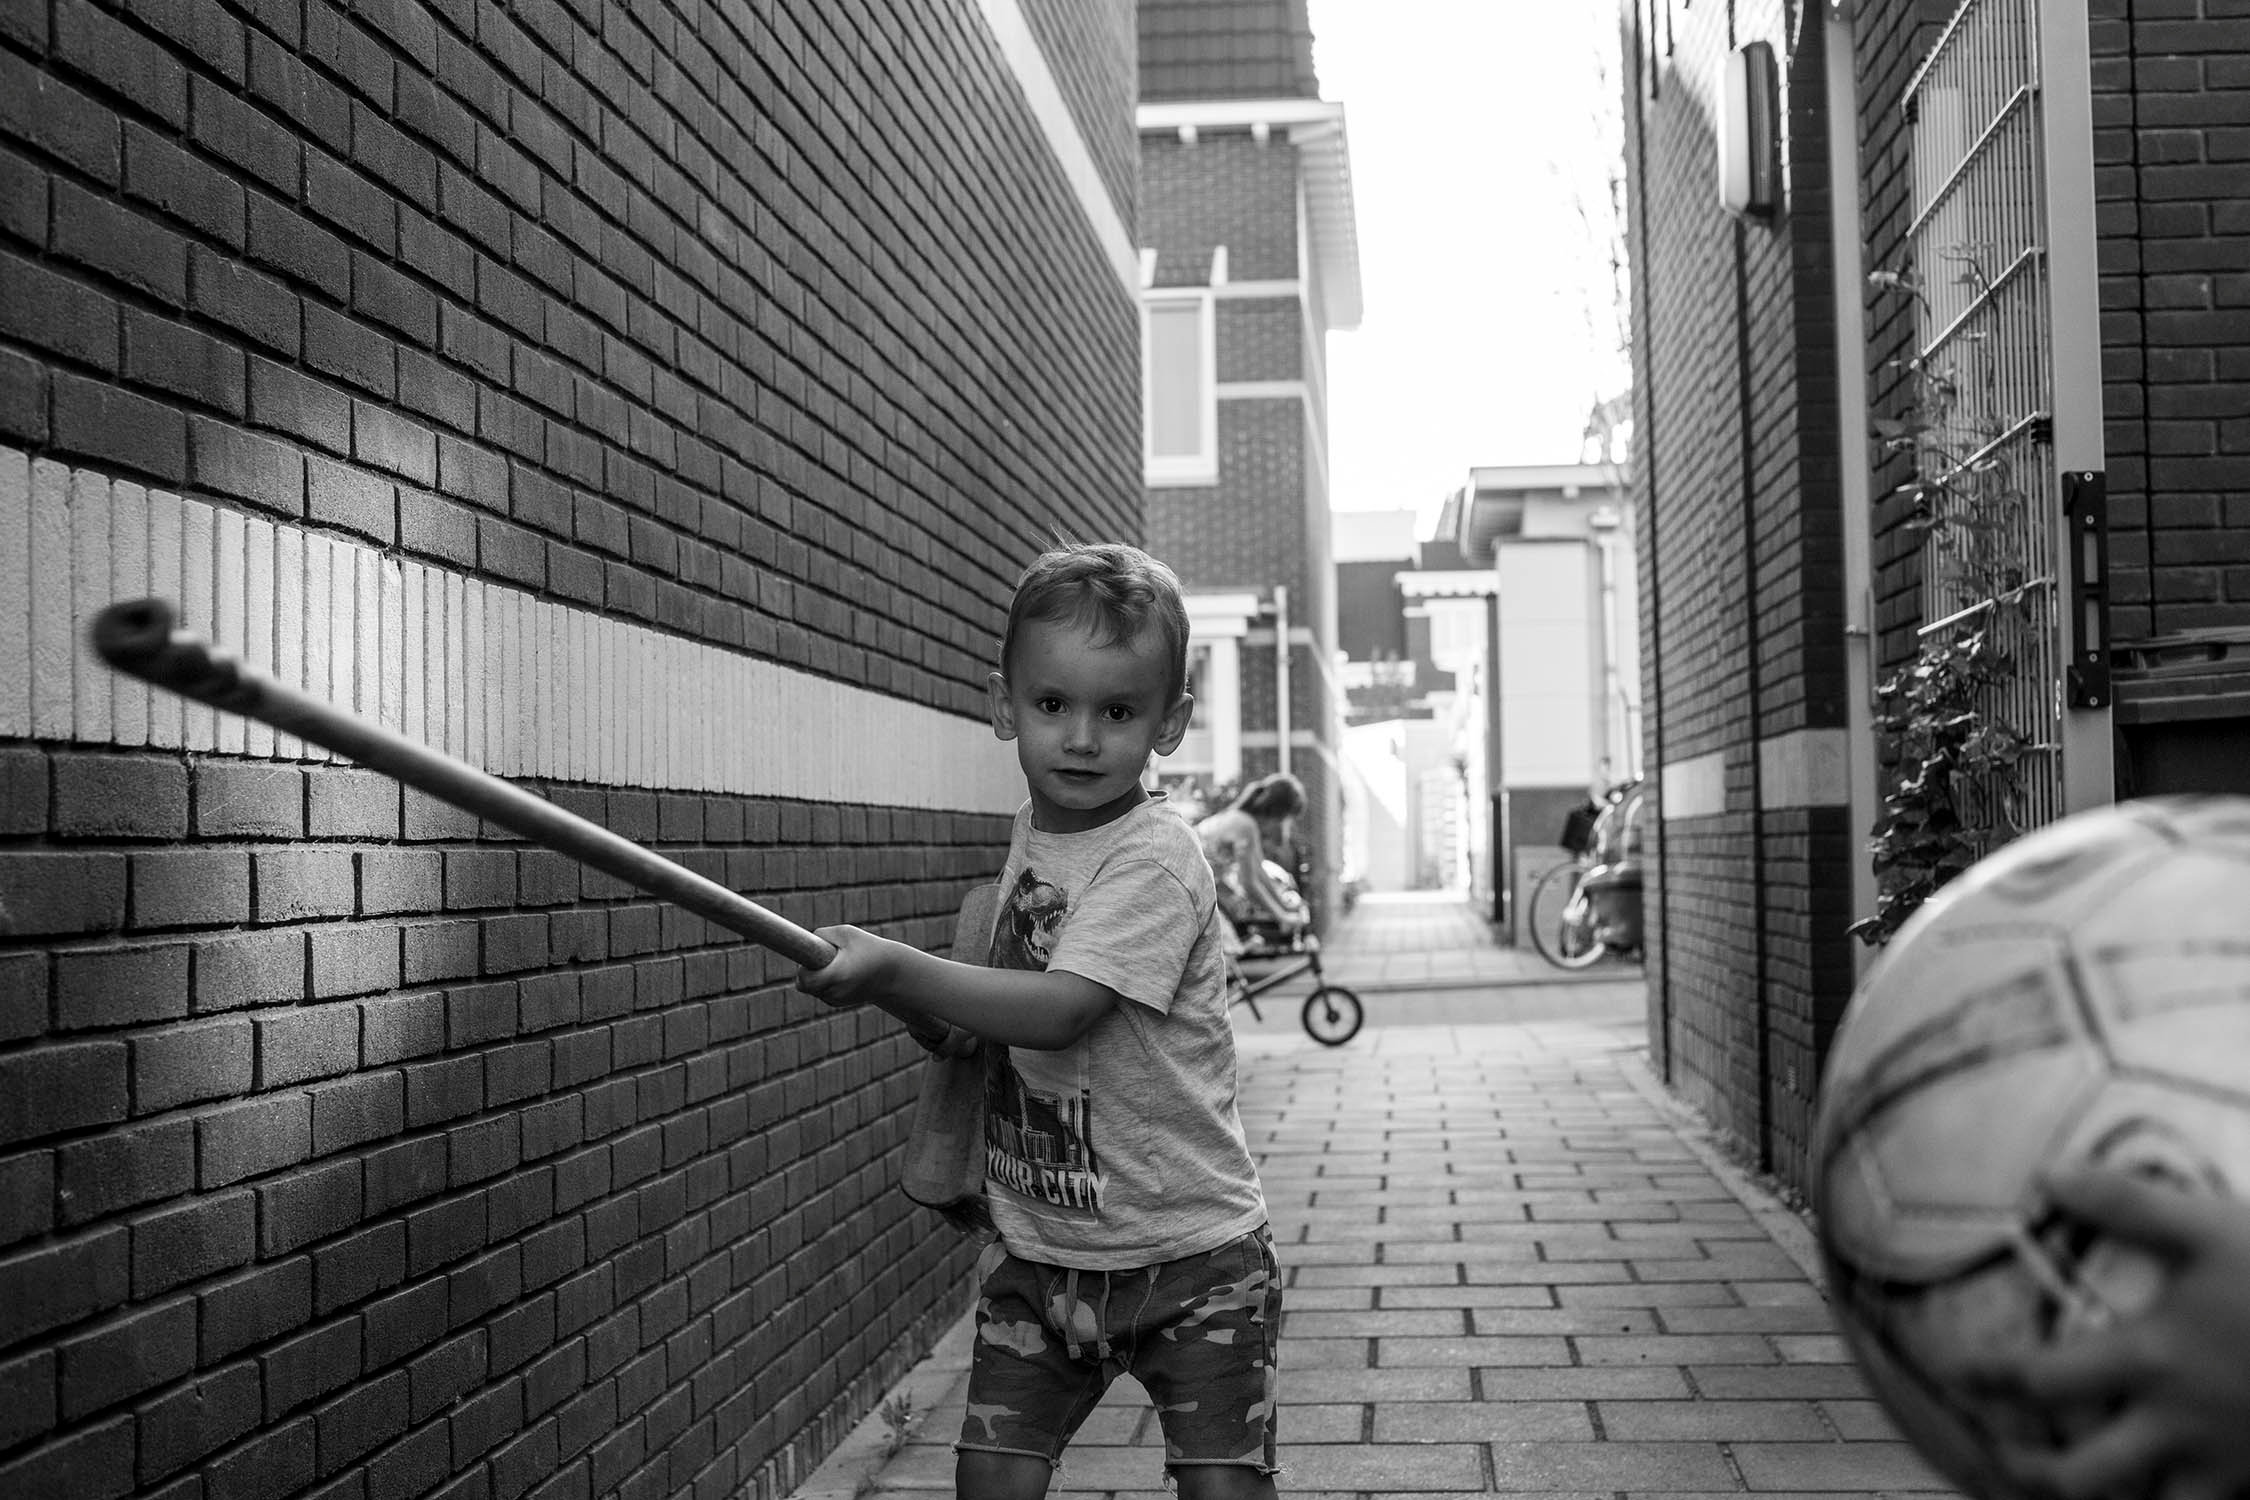 Rikking mmddjj (datum) ©Manon Bruininga 2017_39.jpg